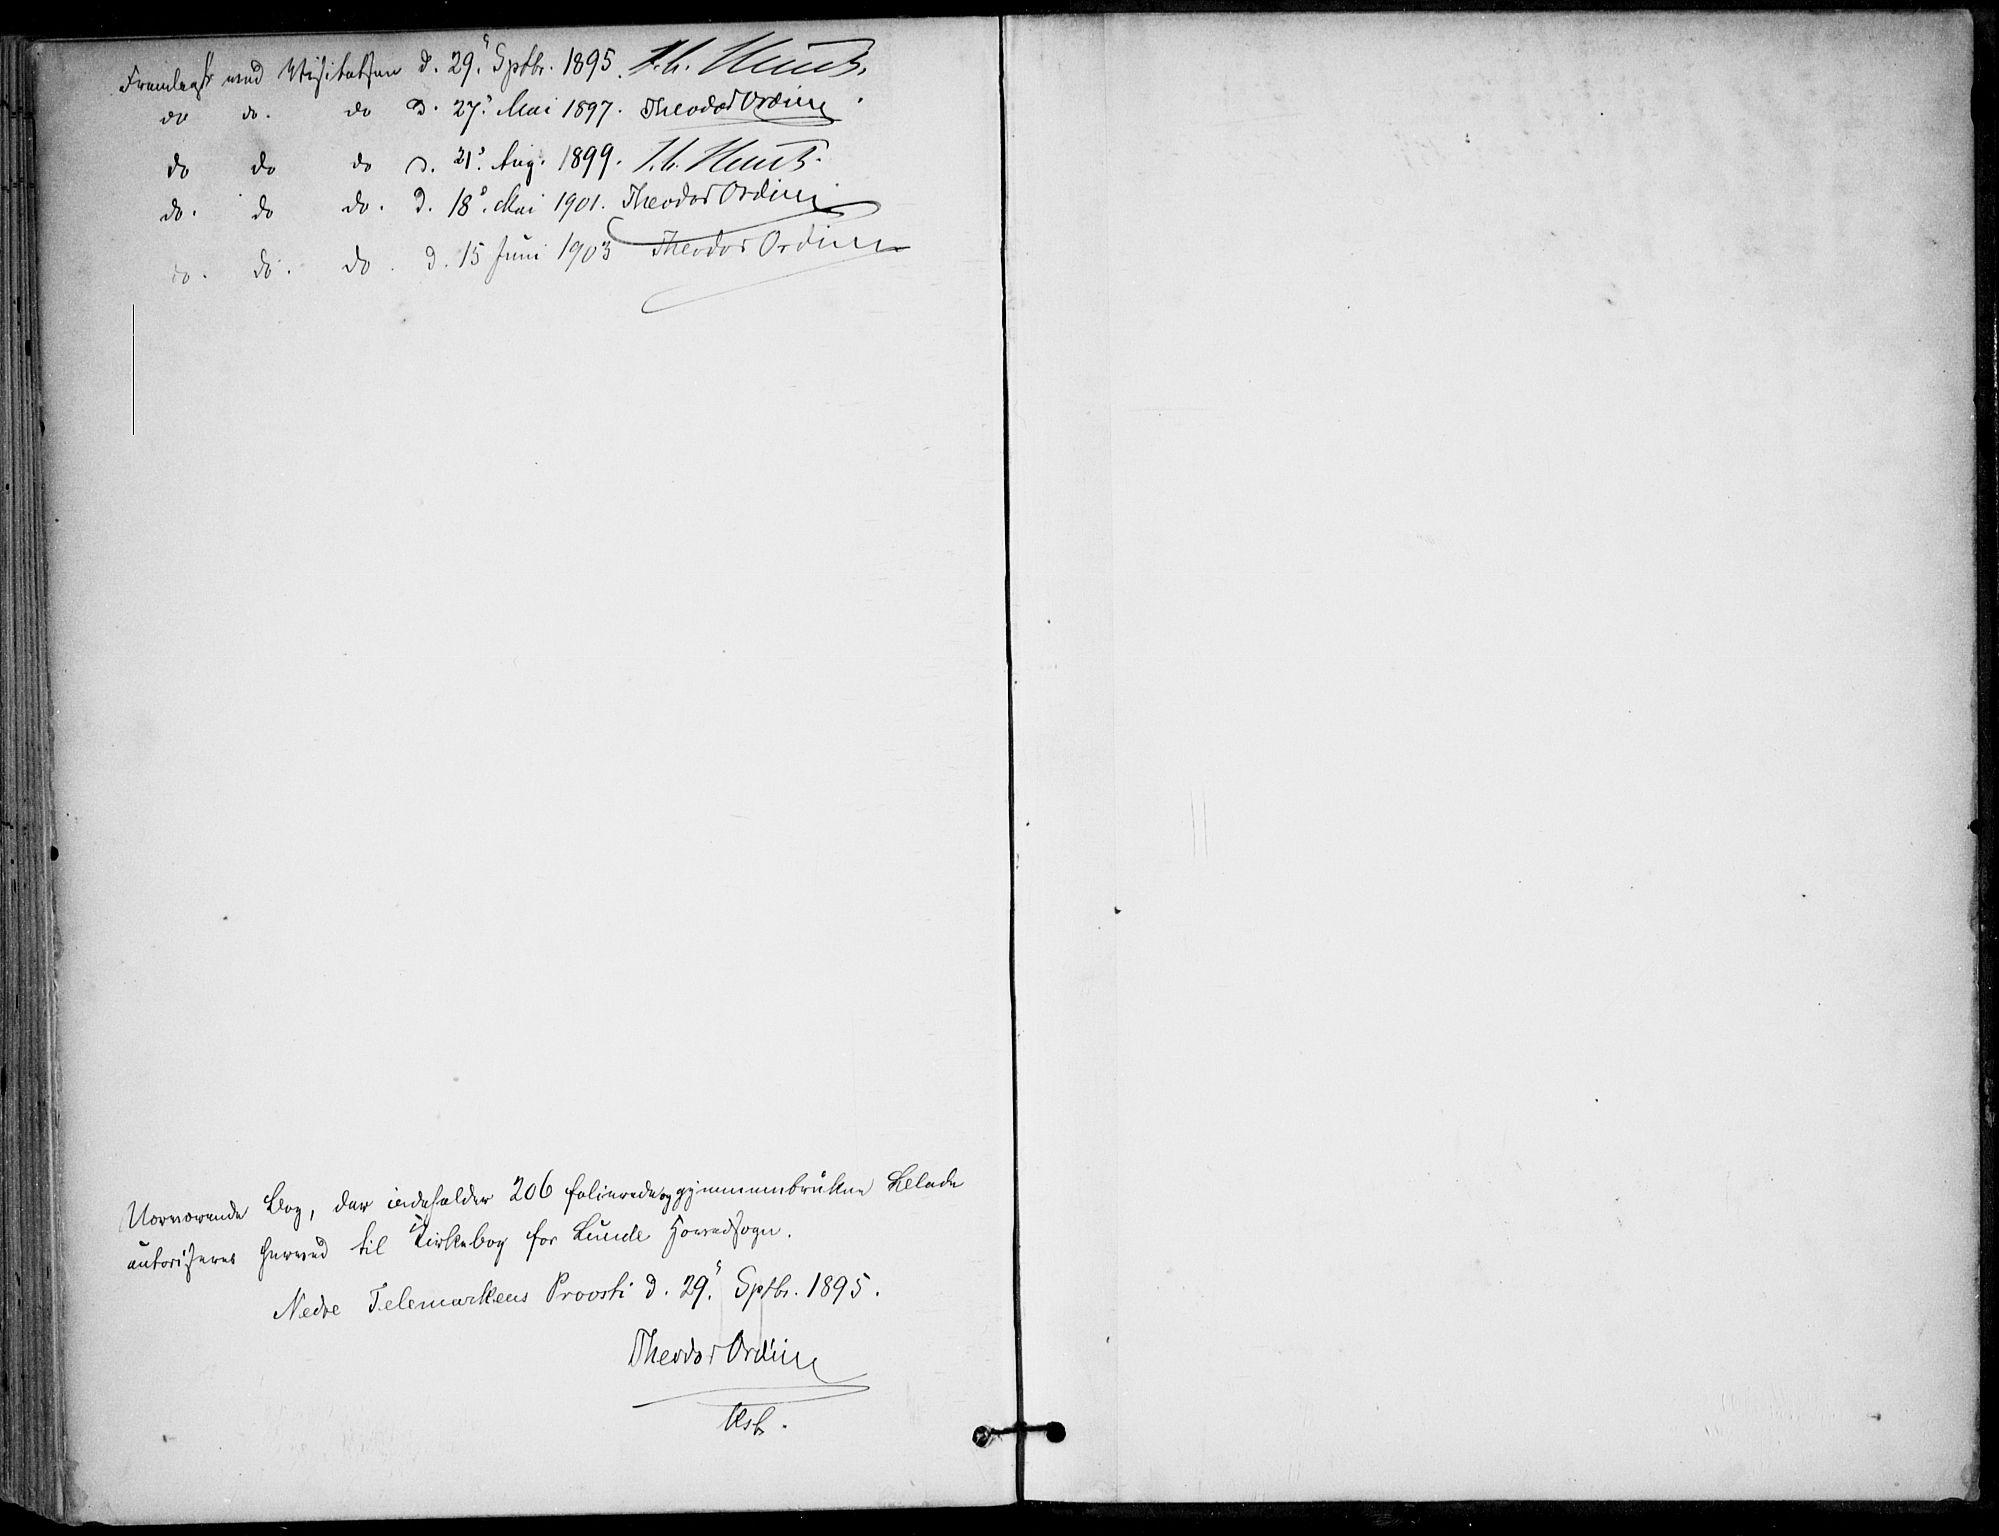 SAKO, Lunde kirkebøker, F/Fa/L0003: Ministerialbok nr. I 3, 1893-1902